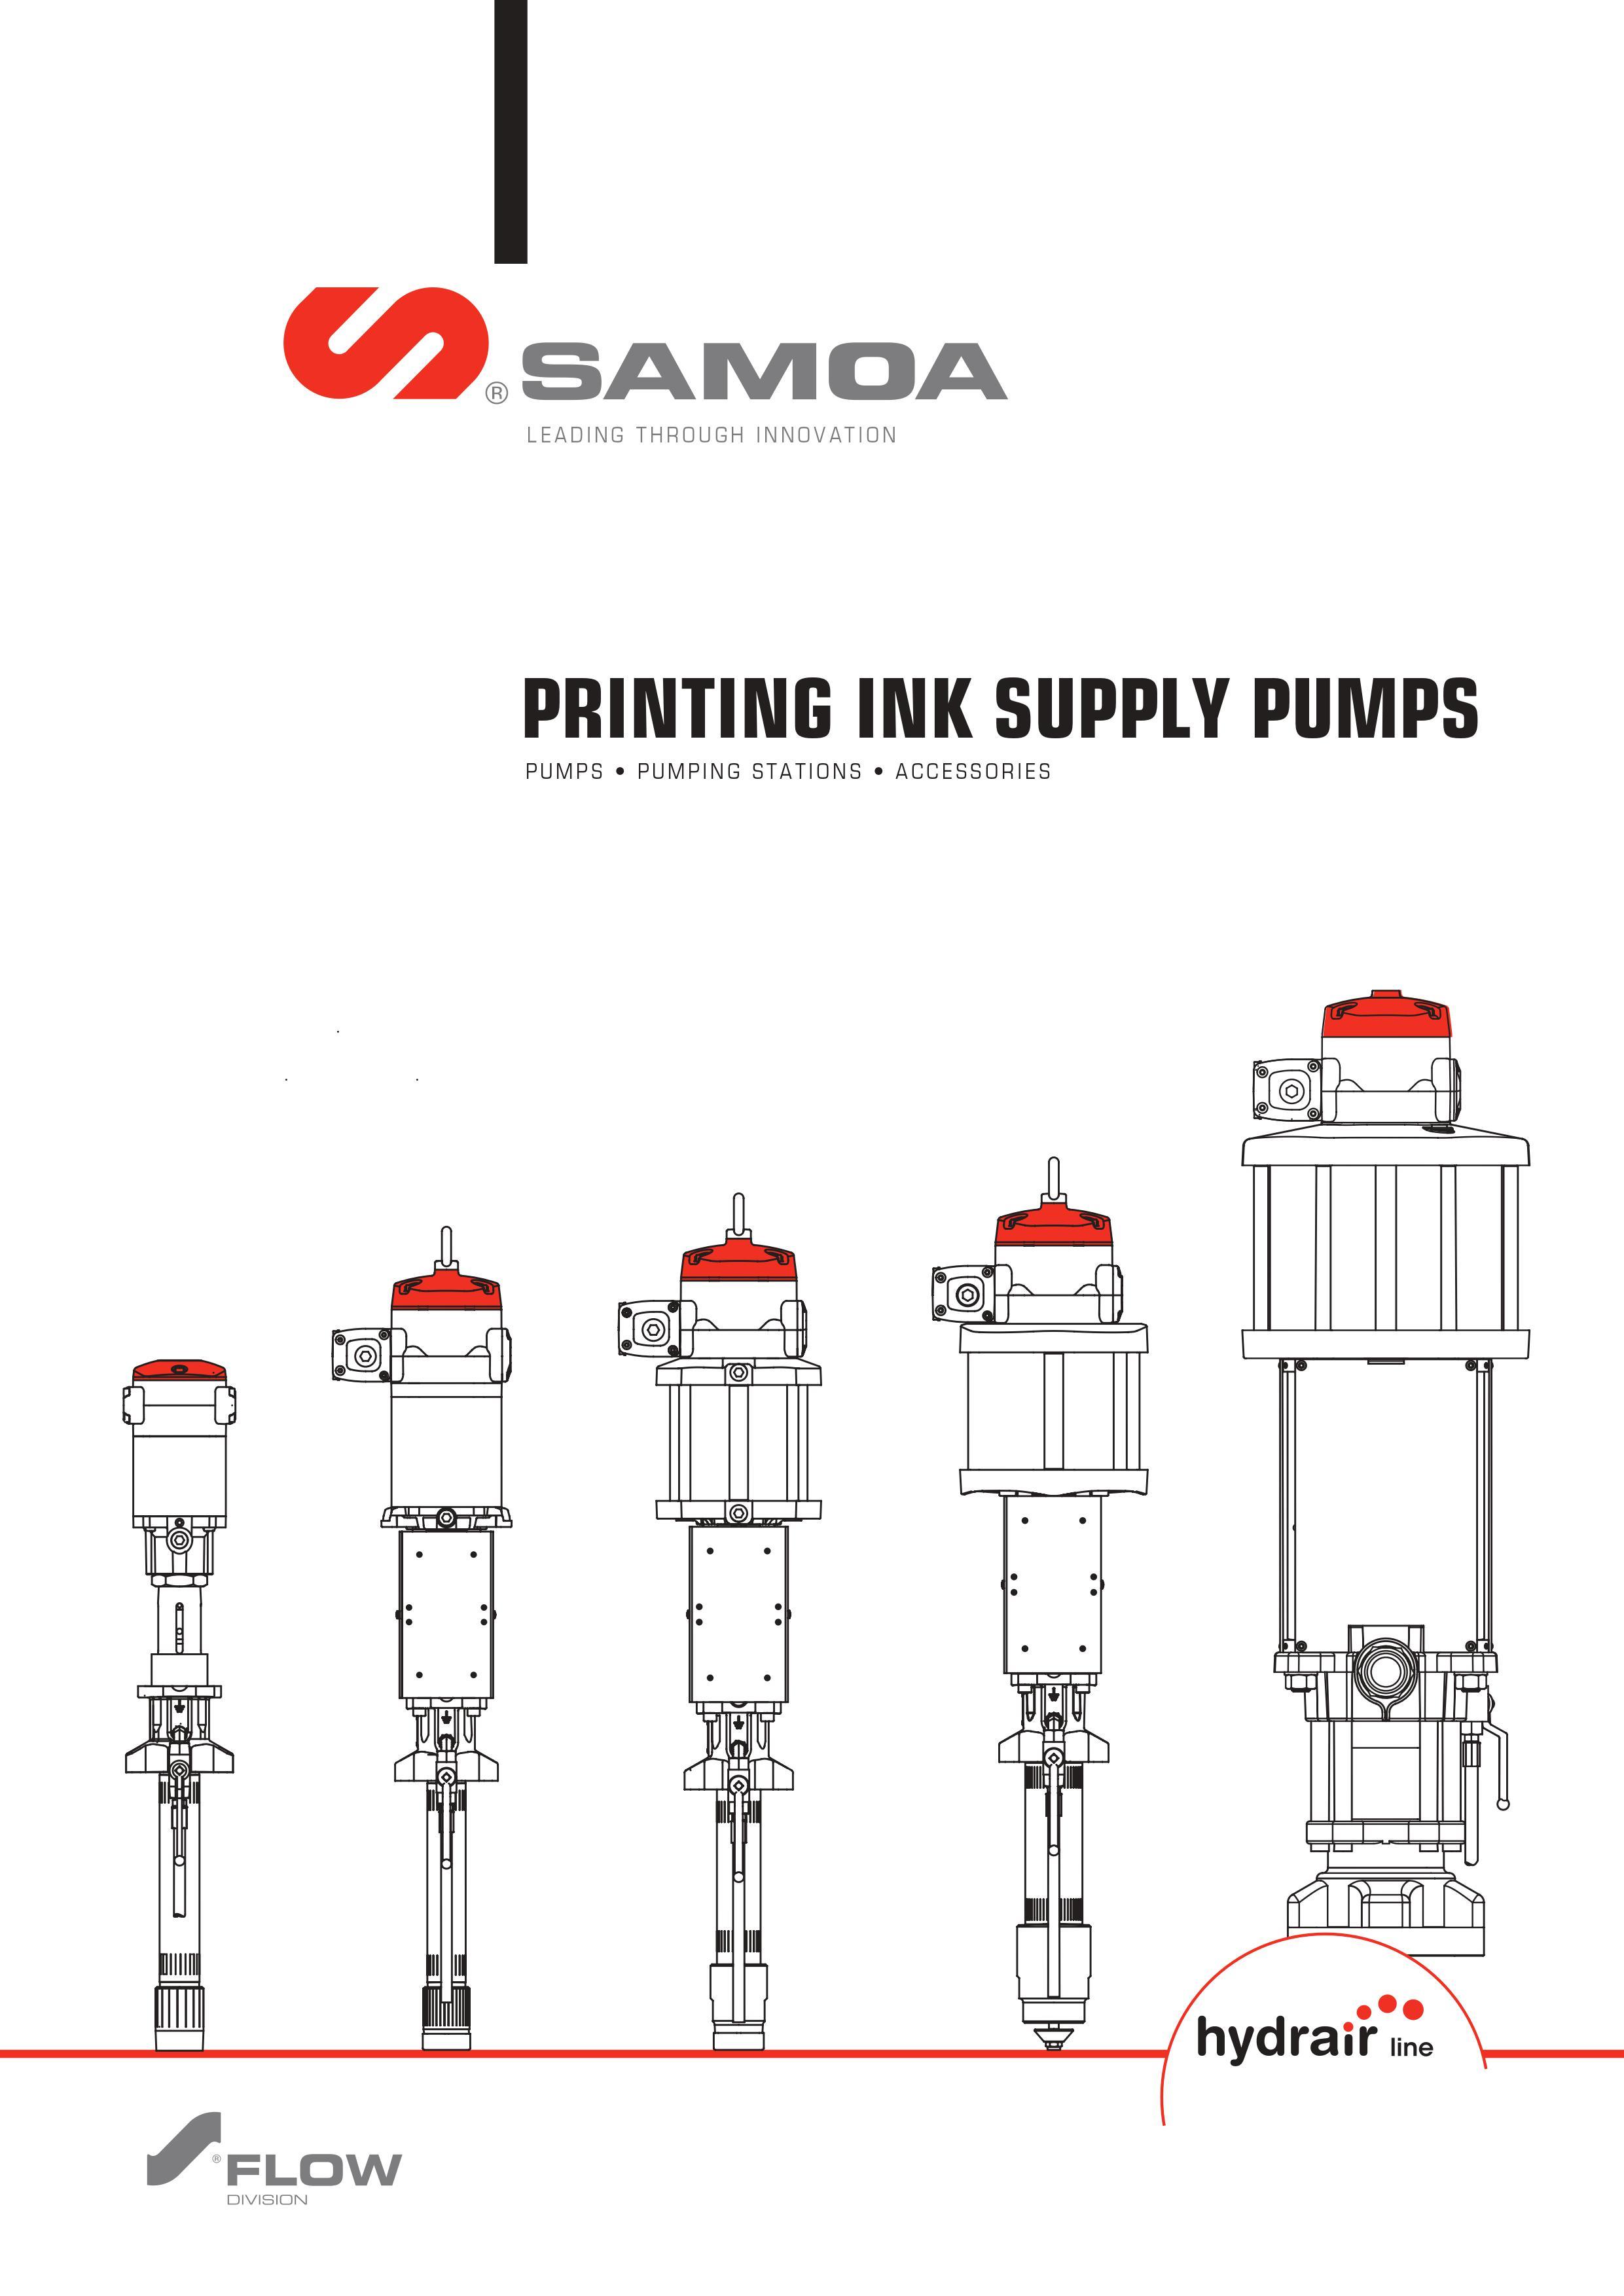 SAMOA Hydrair Pumpmaster Ink Feeding Pumps & Stations Brochure